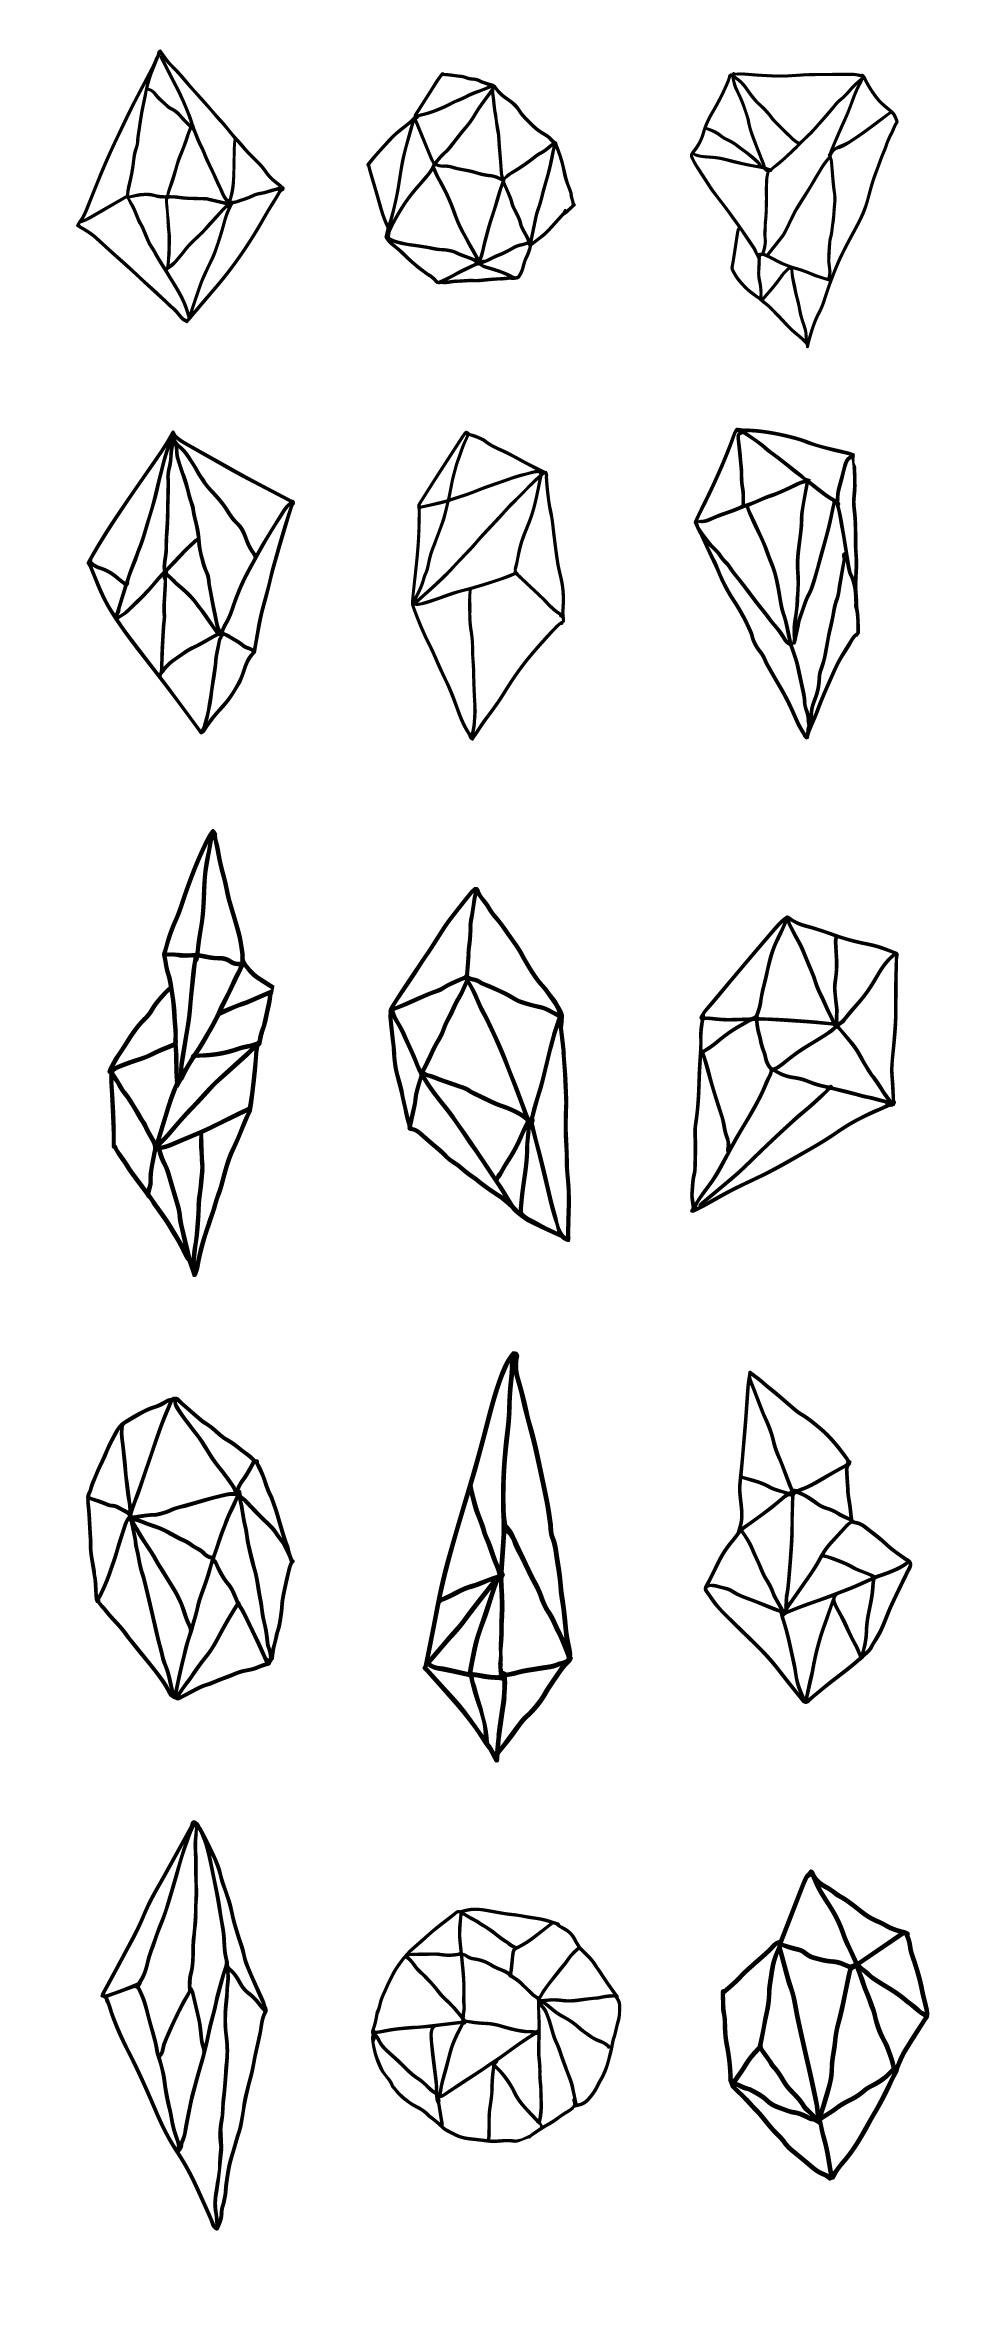 Hand-drawn Geometric Polygons